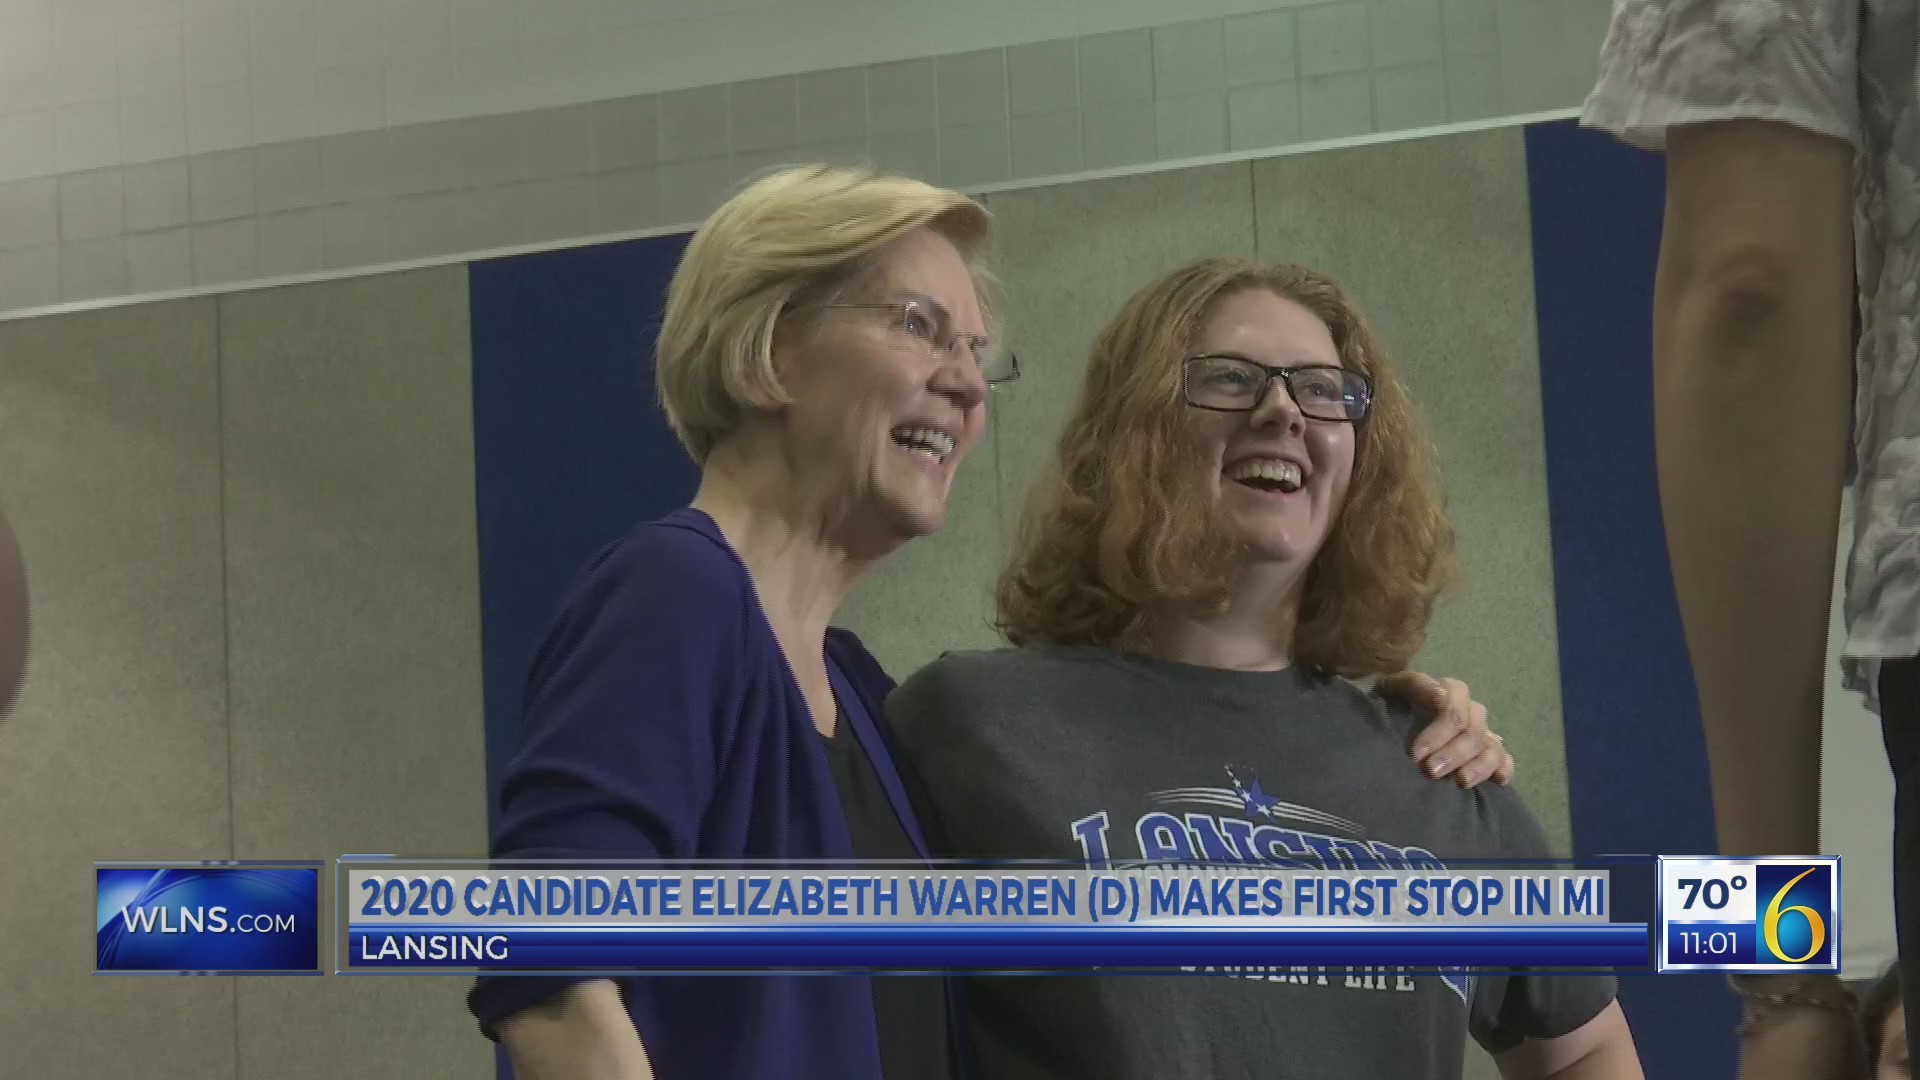 Sen. Elizabeth Warrens rolls out campign stop in Mid-Michigan